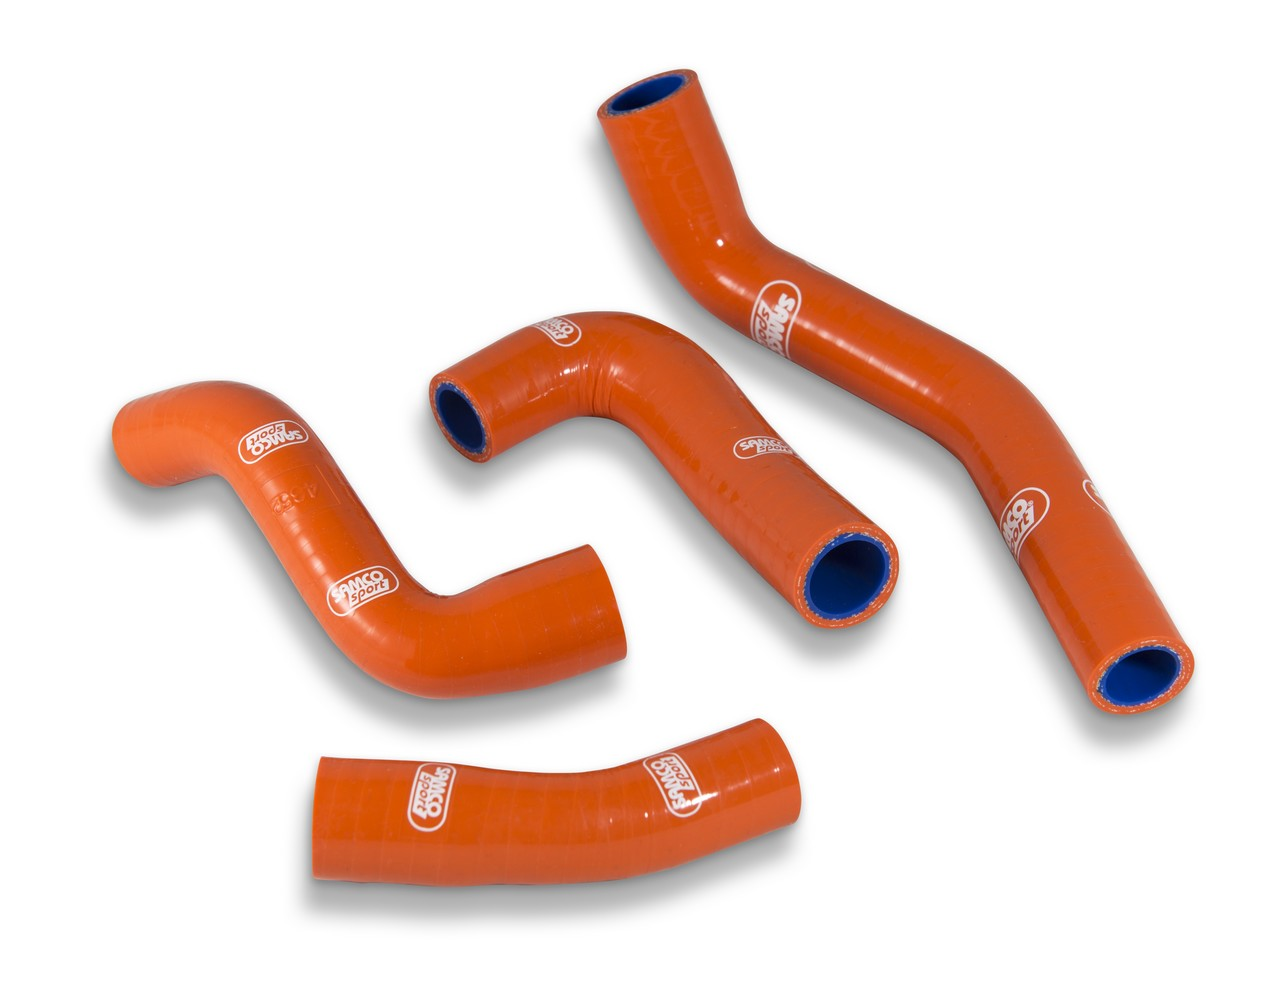 samco sport liquide de refroidissement tuyau de radiateur ktm 87 orange. Black Bedroom Furniture Sets. Home Design Ideas